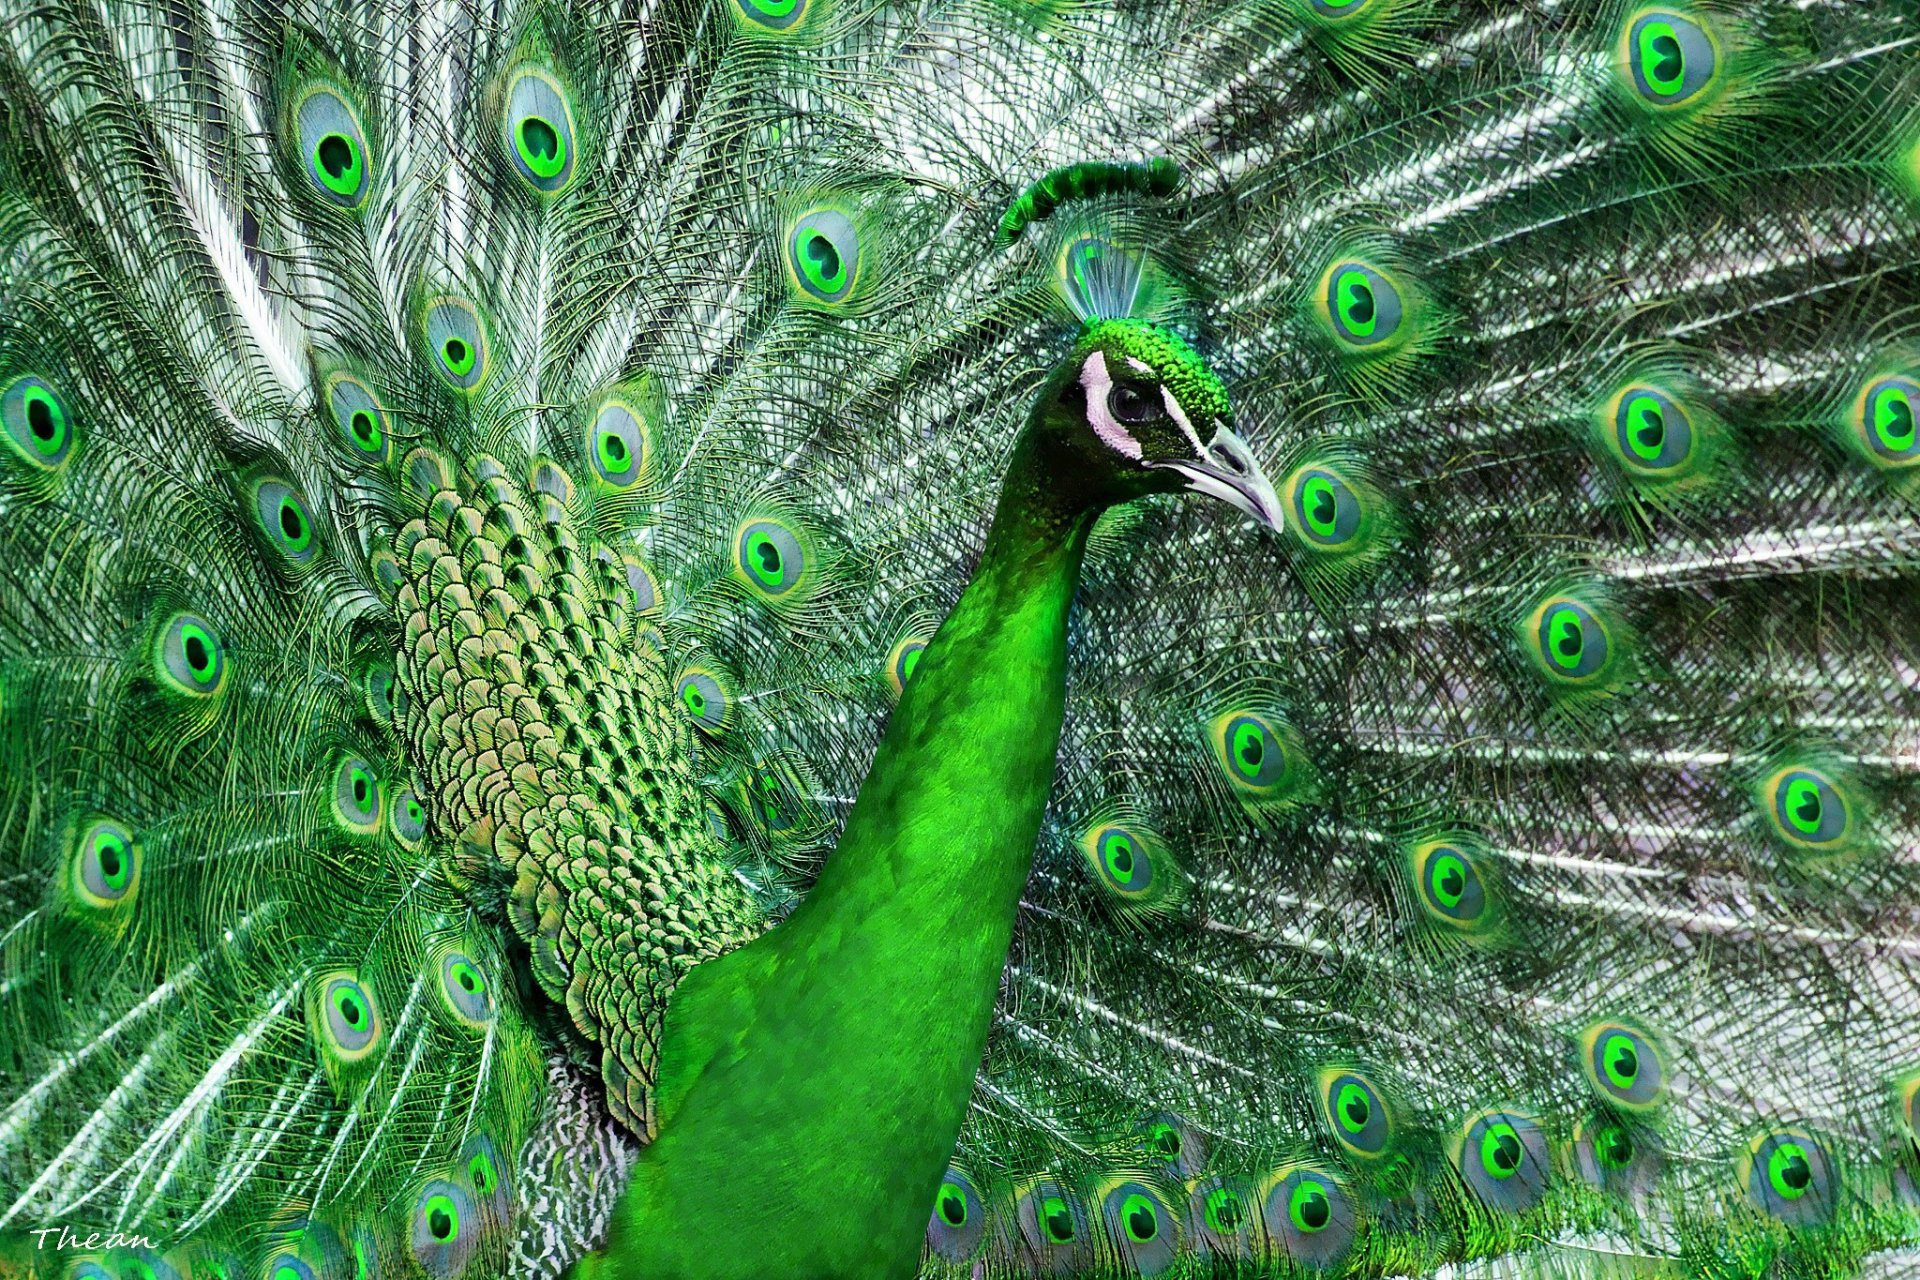 Animal - Peacock  Wallpaper